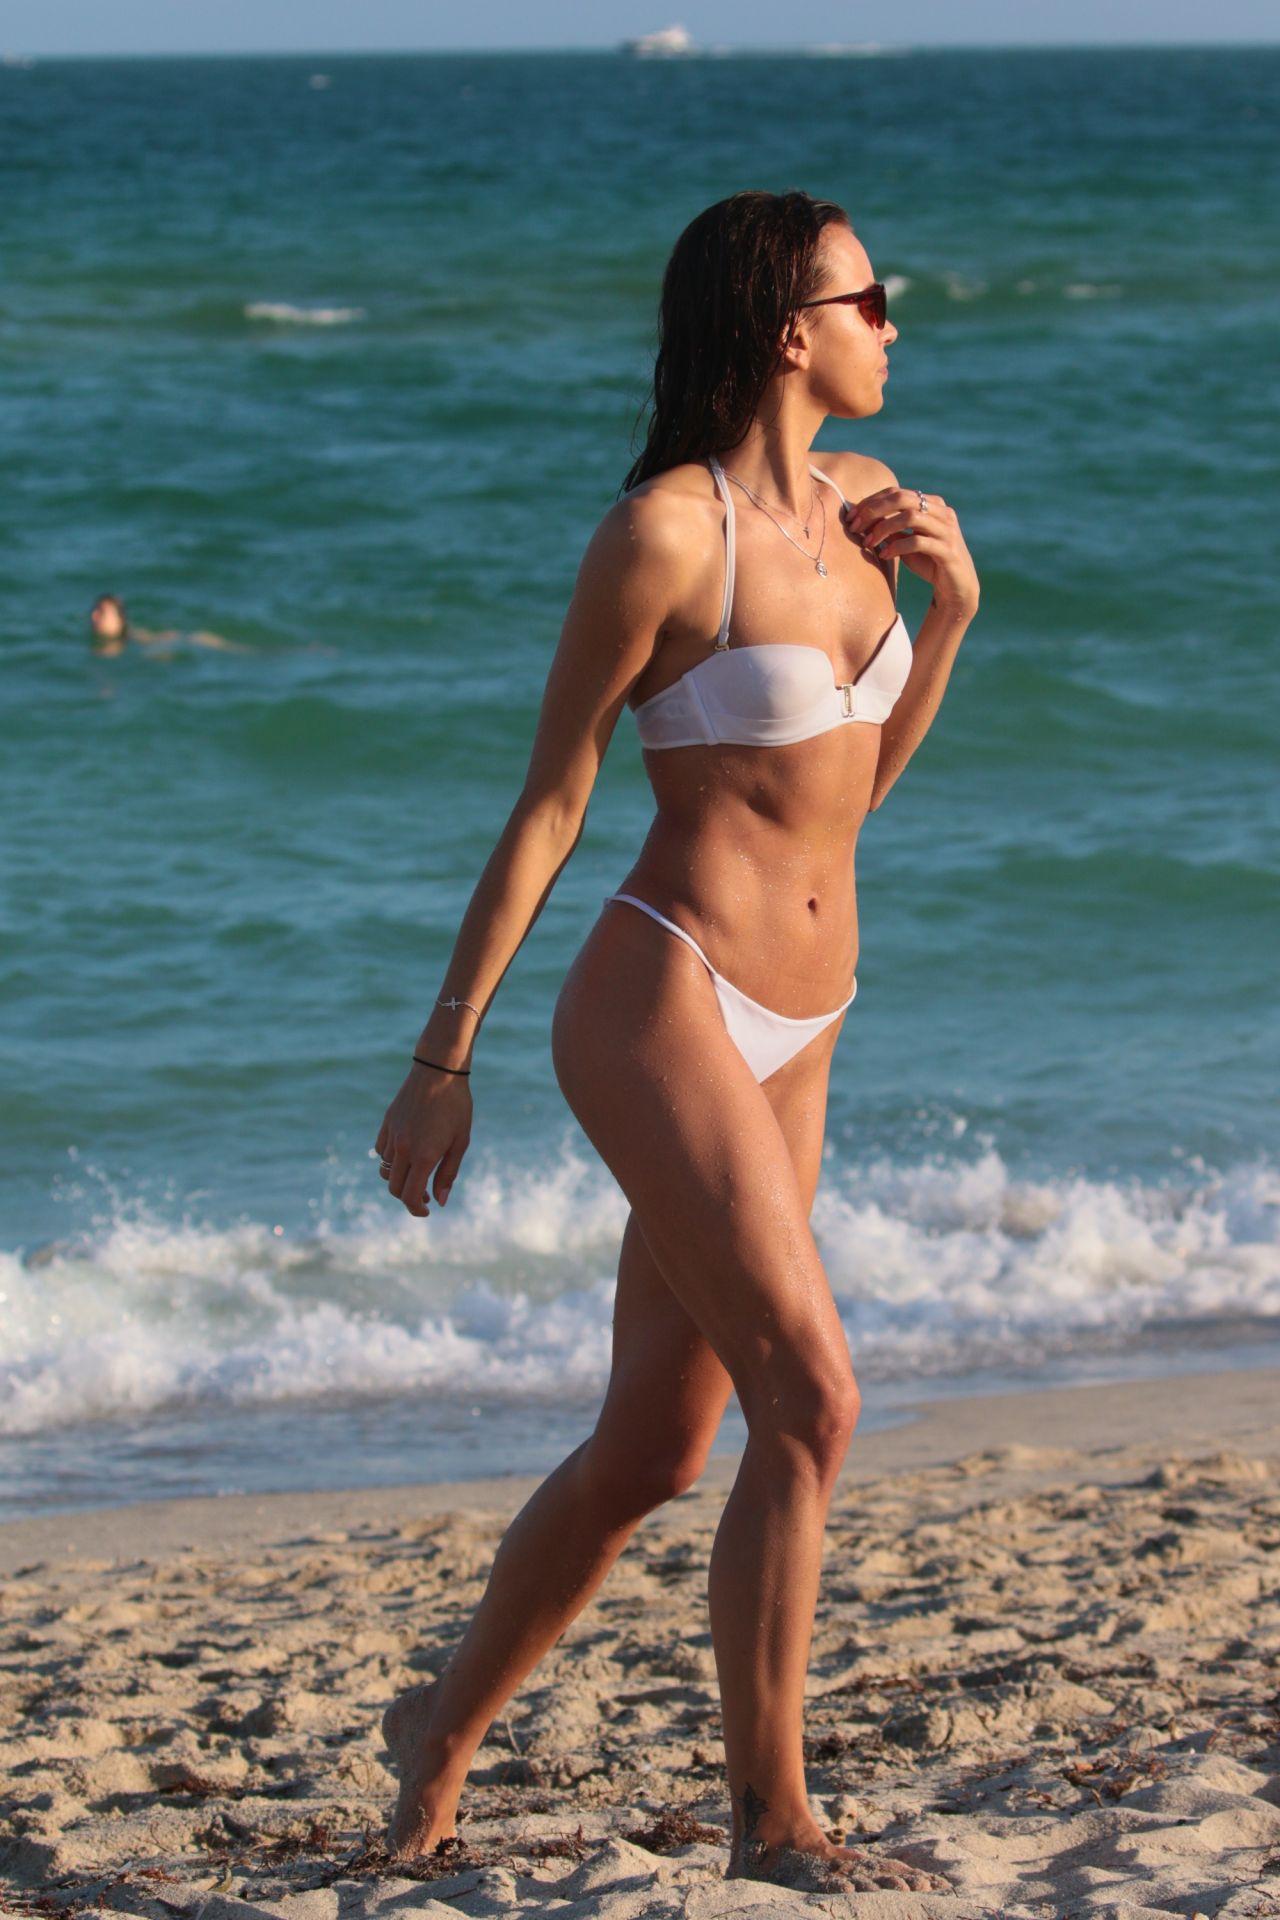 Meri Gulin in White Bikini at the beach in Miami